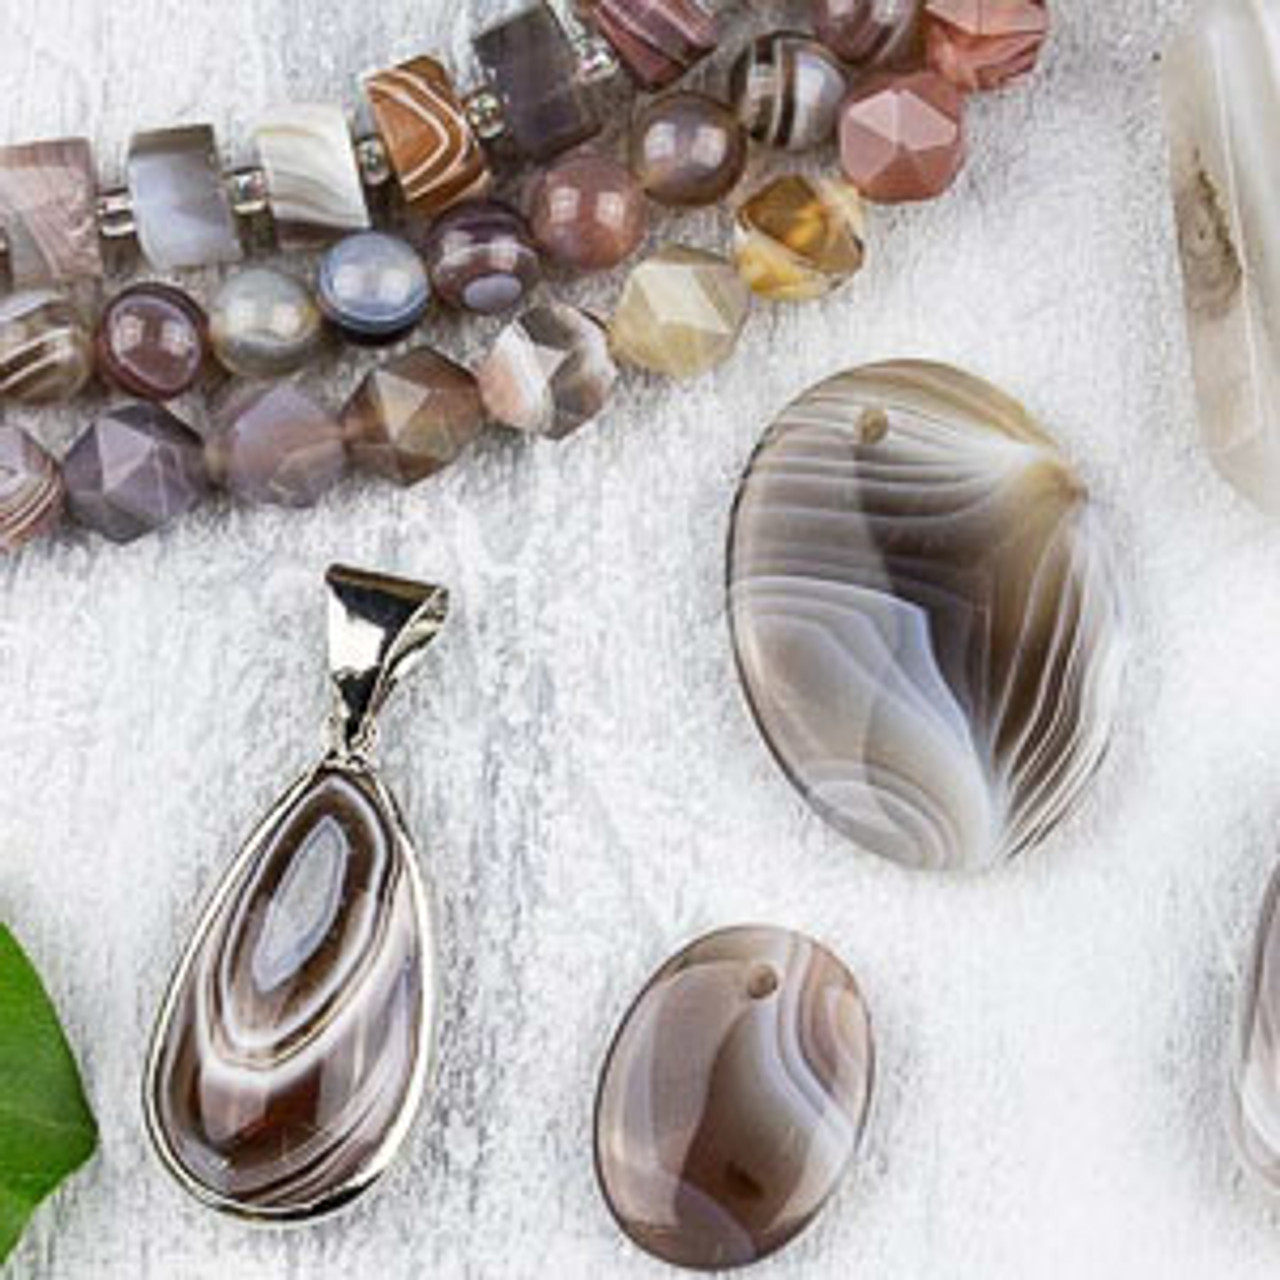 Jade Beds Crystal Beads Botswana Agate Pendant Pastel Pink  Mint Green Milk Quartz  Multi-Strand w Matching Earrings